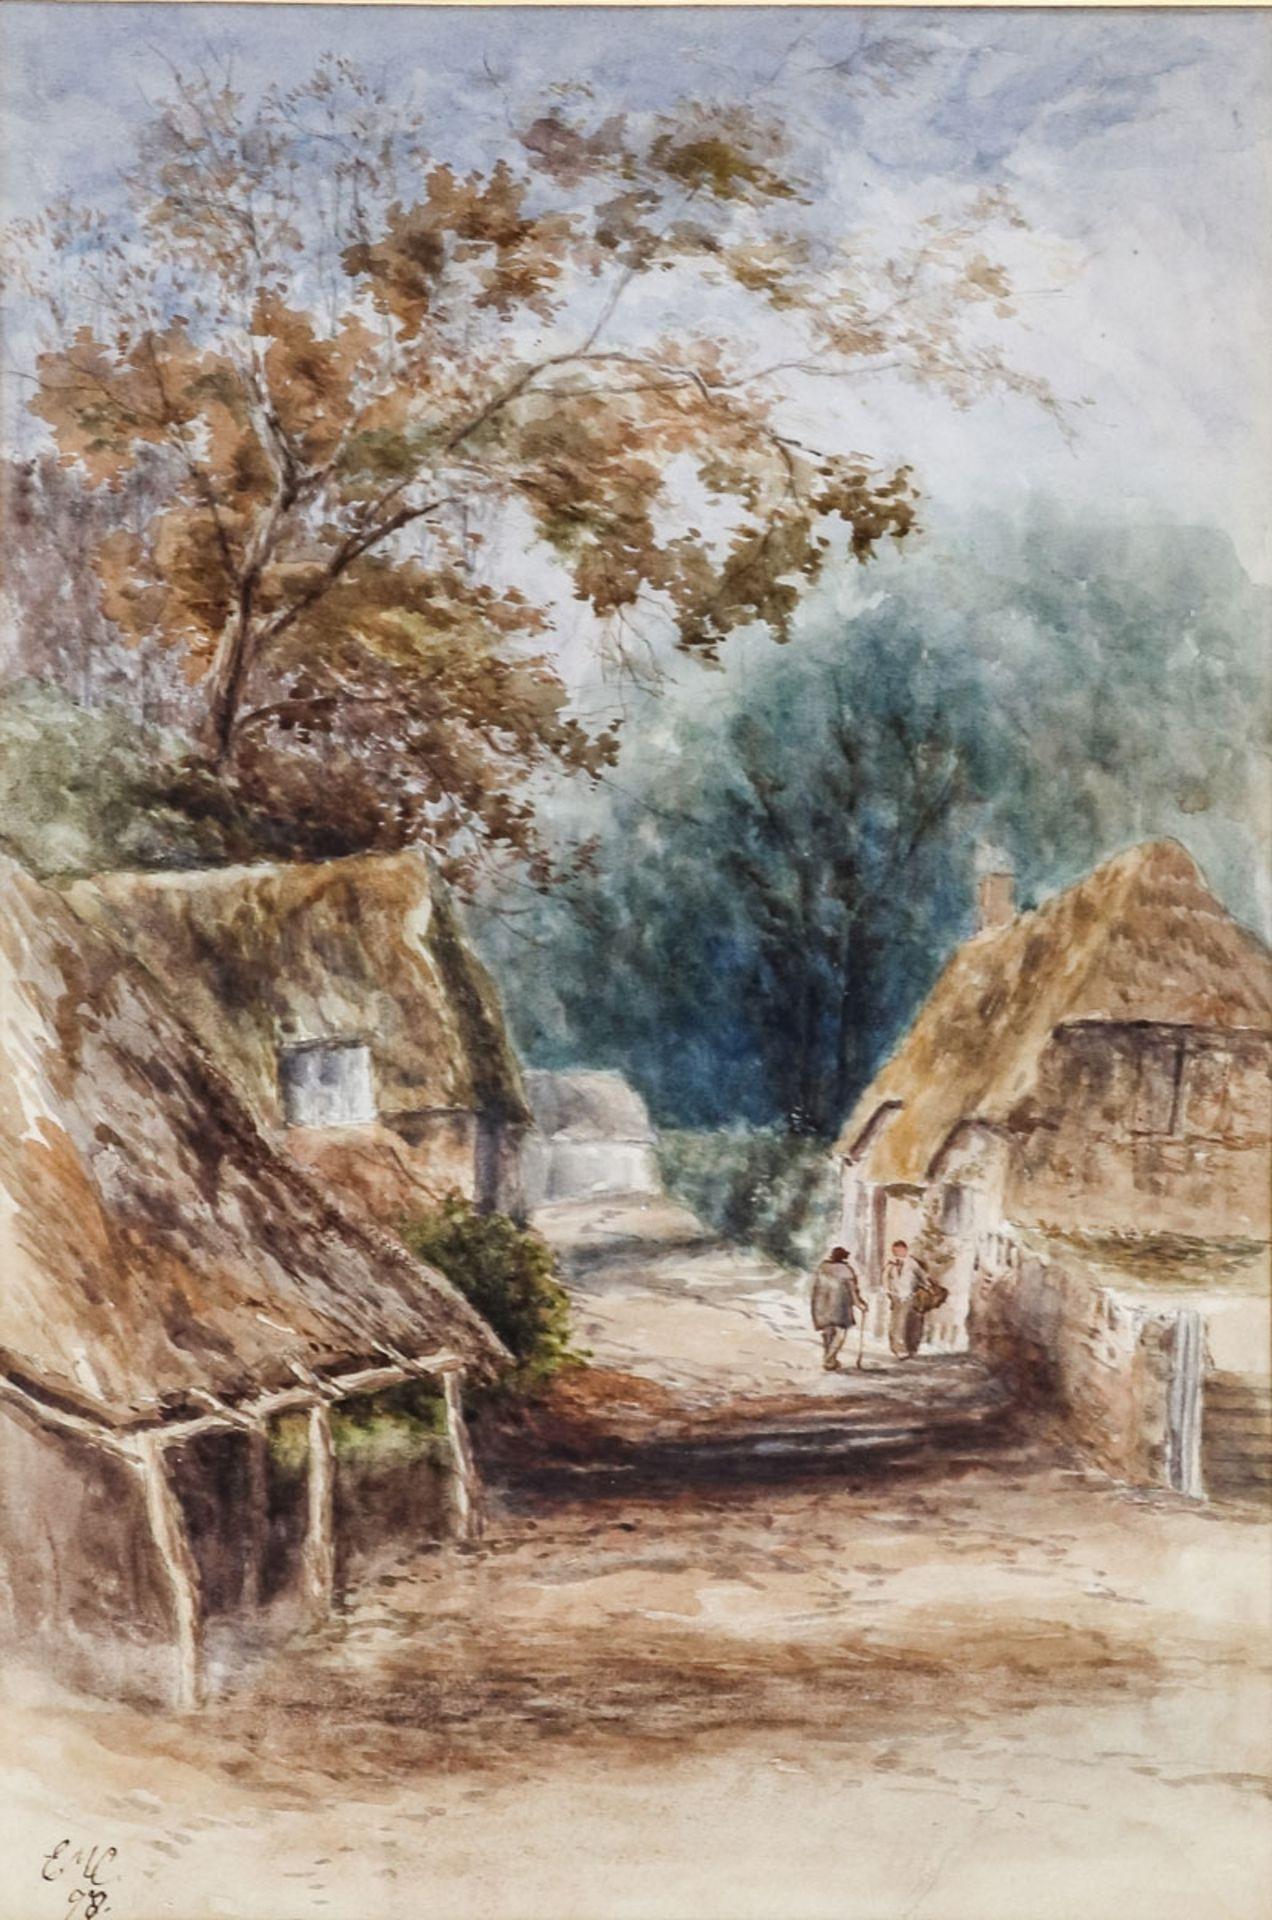 Ethel Mary Clarke - Bild 2 aus 4